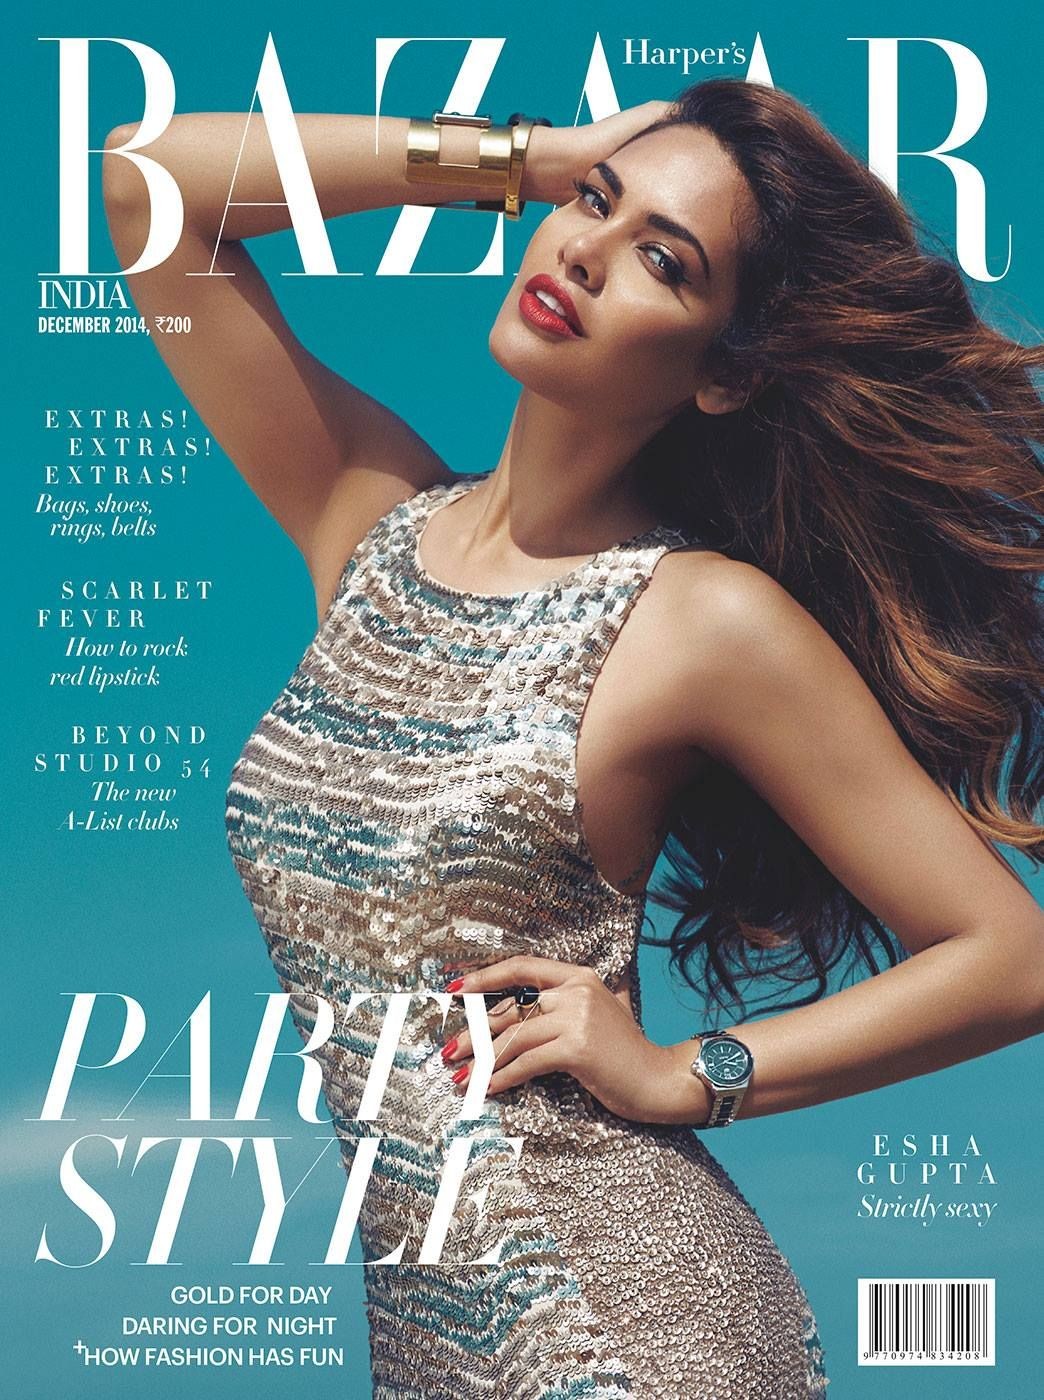 Harper s bazaar event looks more like a lingerie party page 12 - Esha Gupta Harper S Bazaar Magazine Cover India December